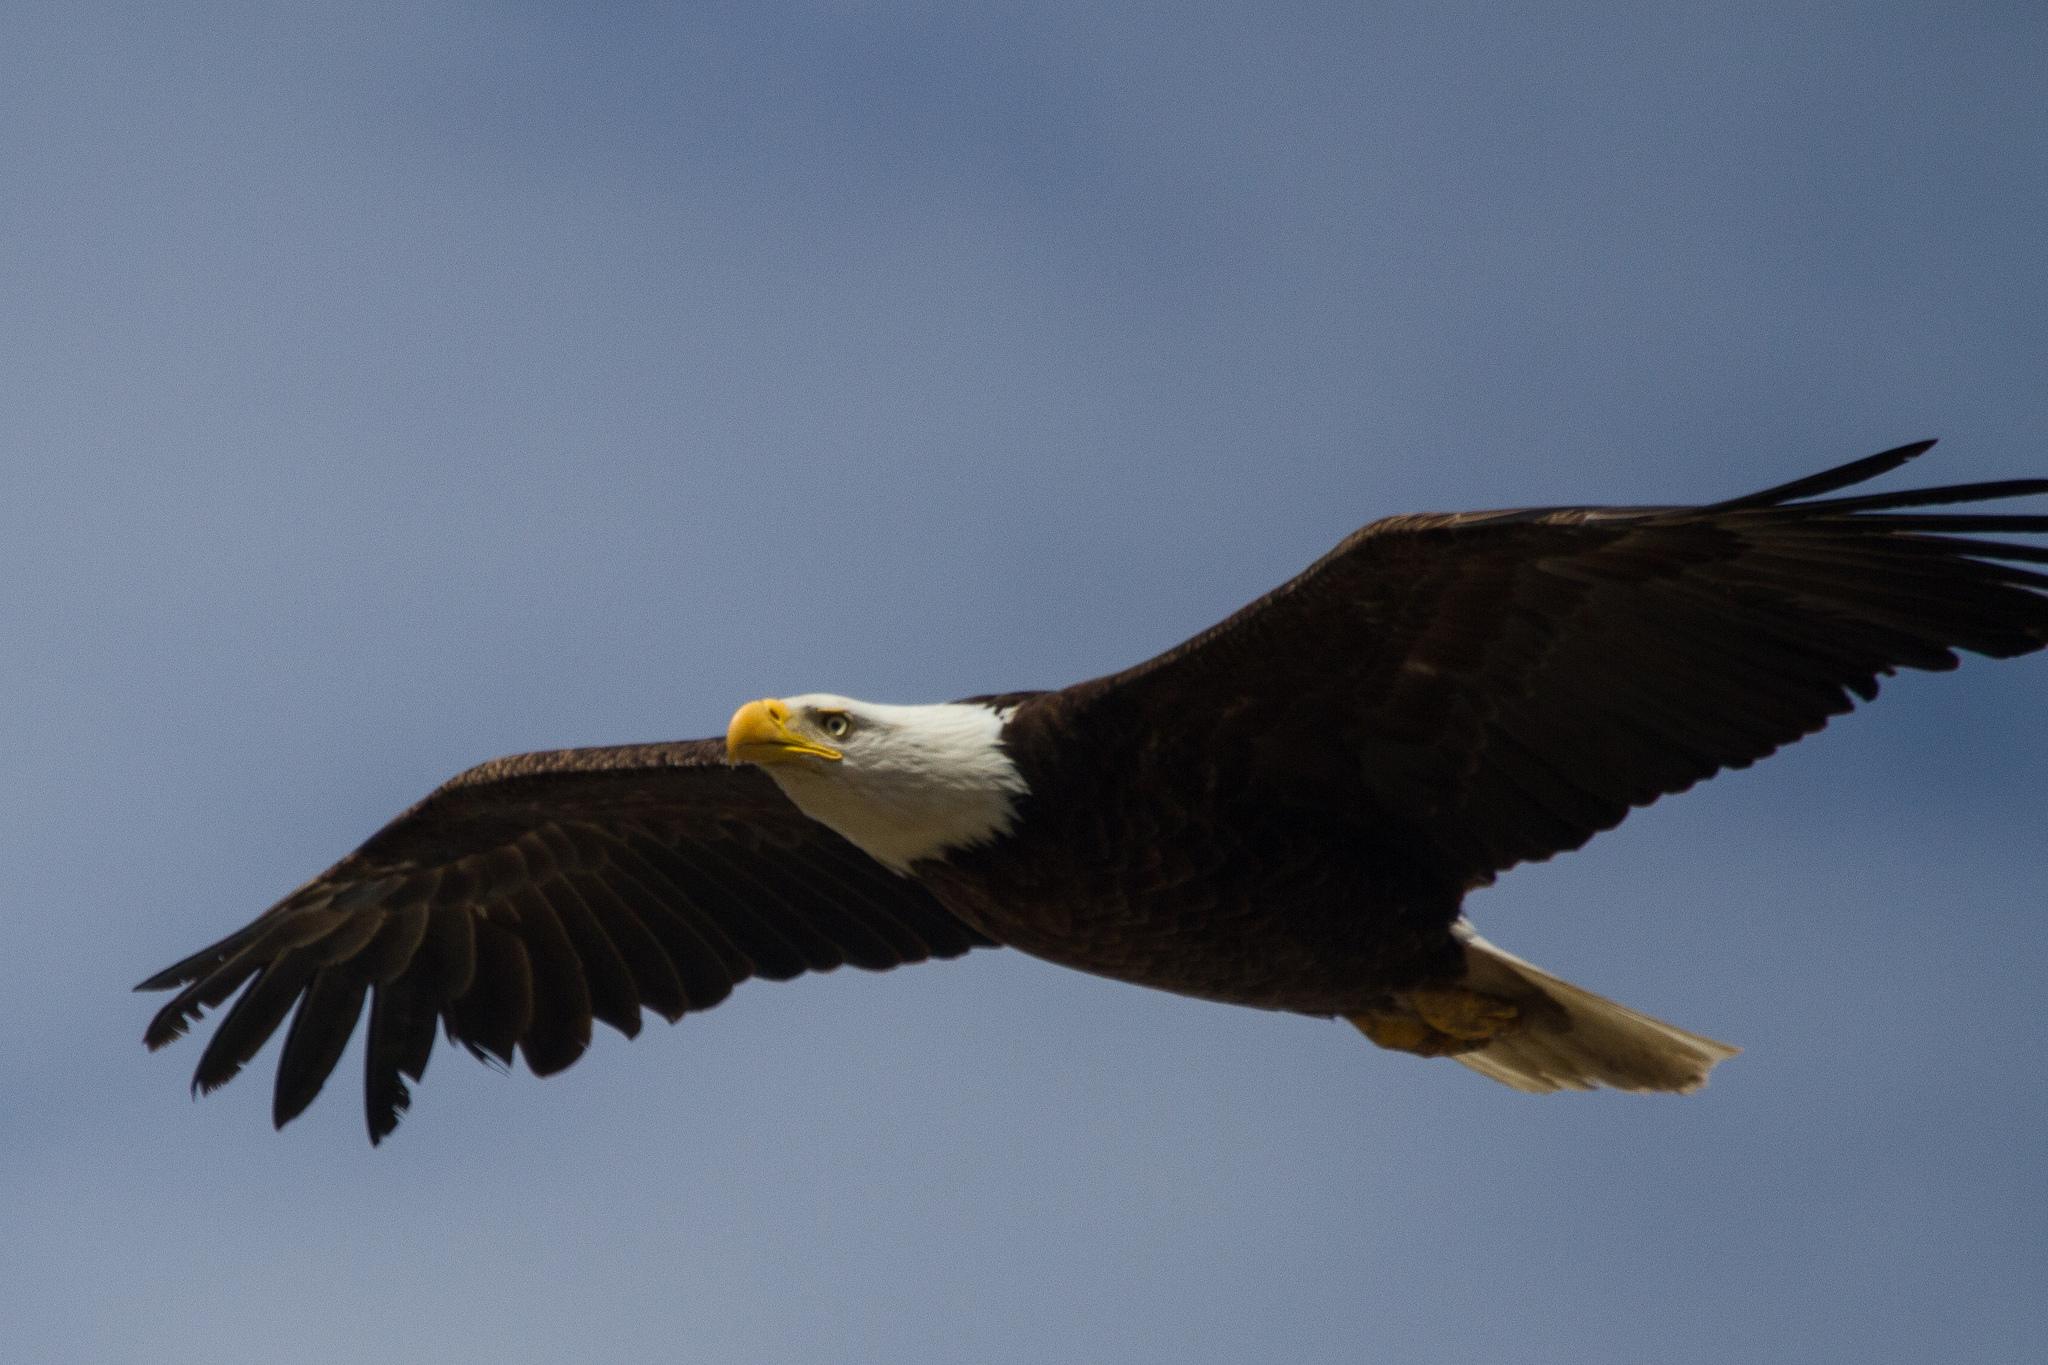 California Evotis Eagle Wing Diagram Of Bald 7324985144 8550b1c25f K1